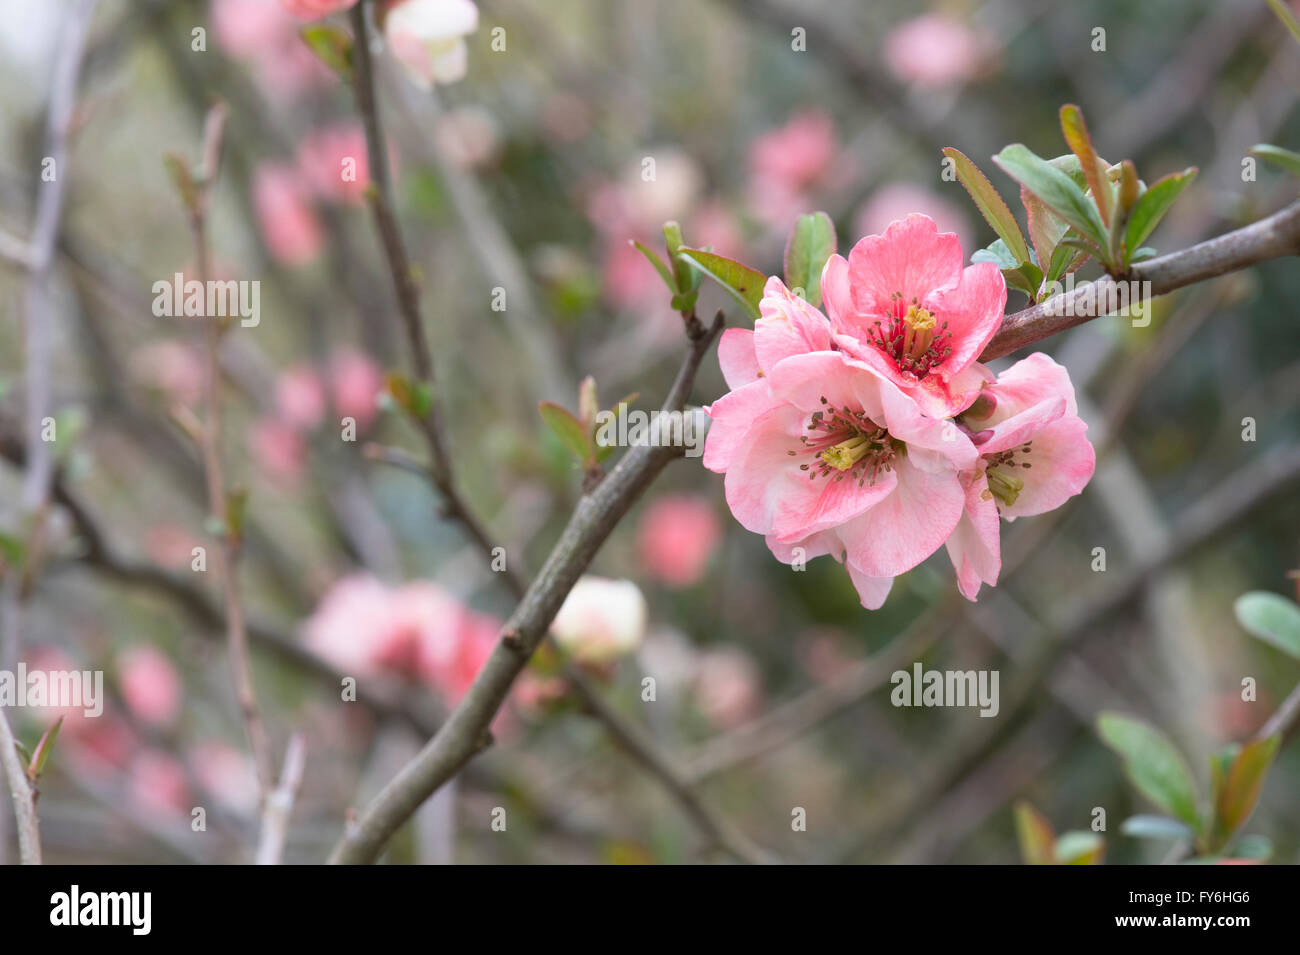 chaenomeles x superba u0027ernst finkenu0027 japanese quince flower stock image - Quince Flower